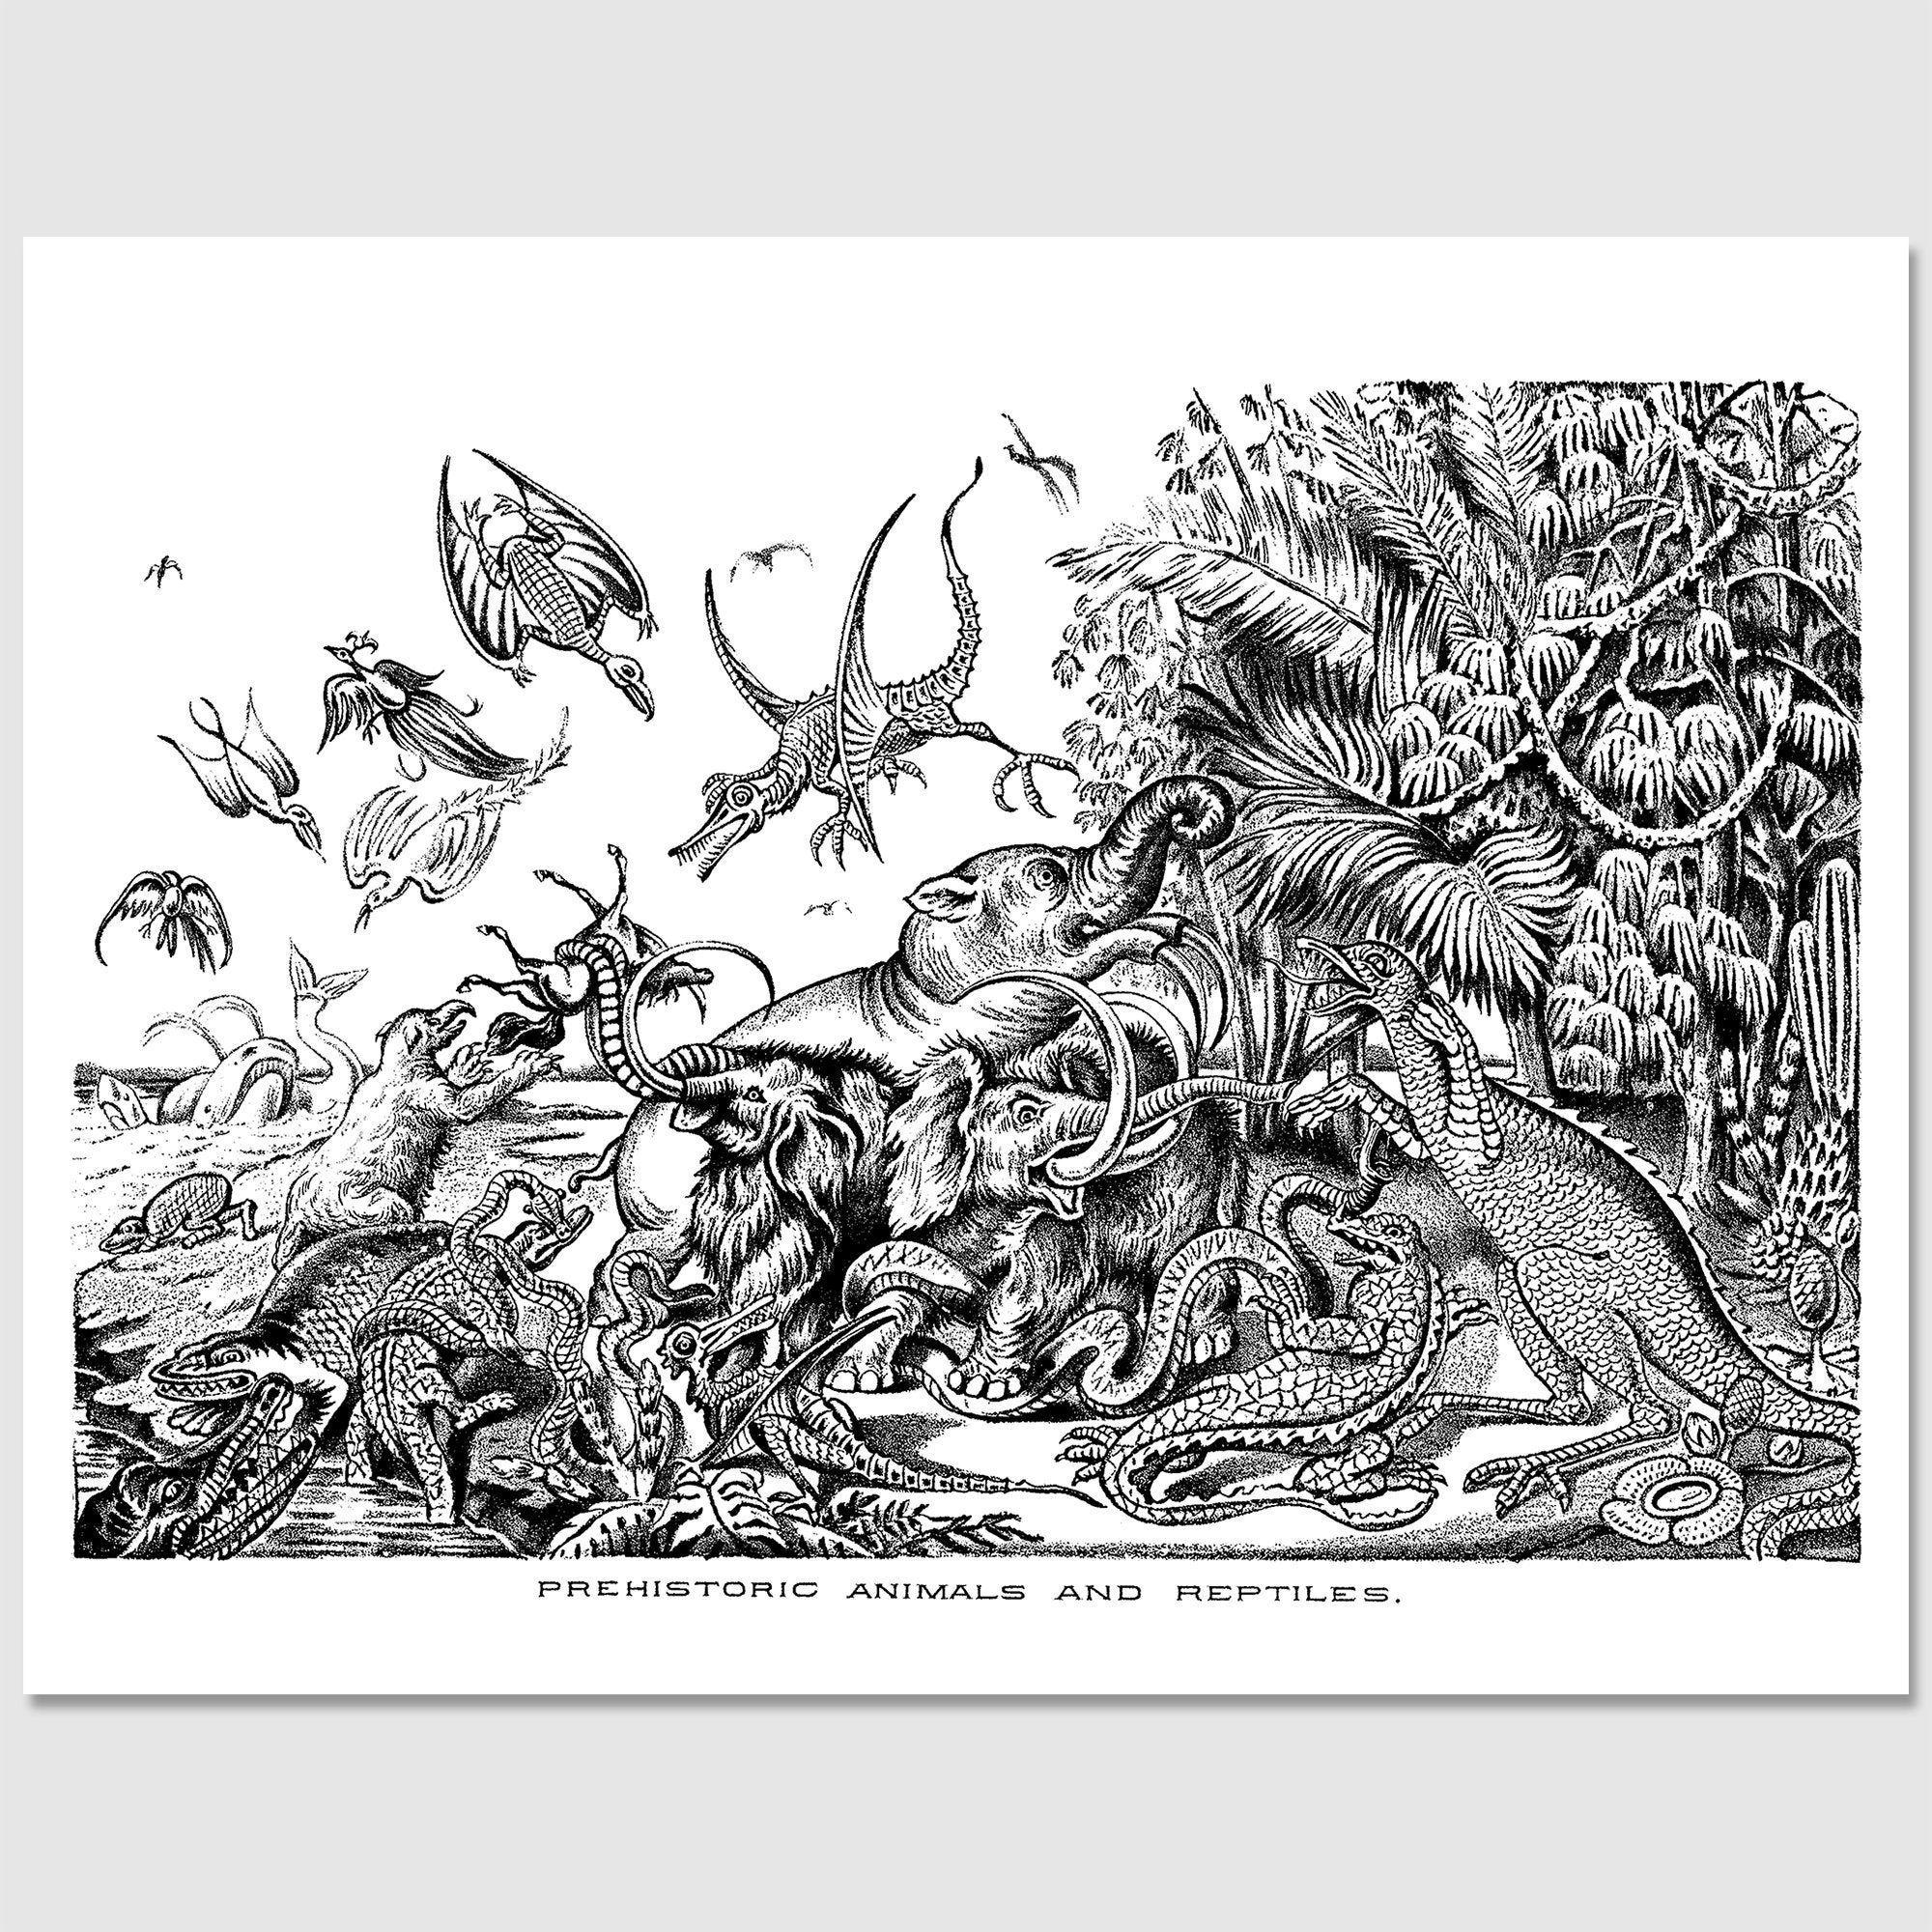 Printable Adult Coloring Page Prehistoric Animals & Reptiles Victorian Dinosaurs Wooly Mammoth Pterodactyl Mastadon Dinosaur 8x5